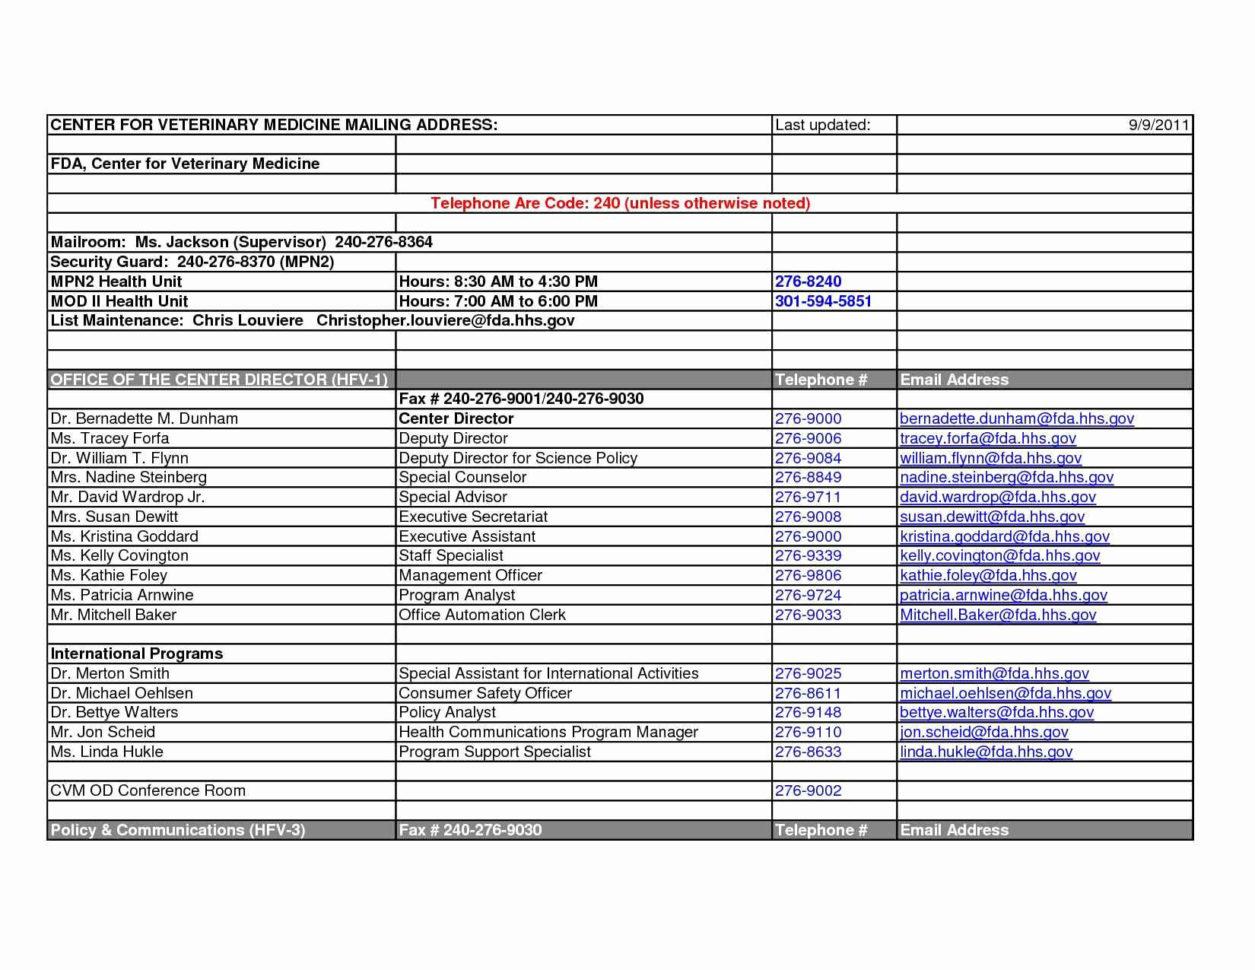 Restaurant Inventory Spreadsheet Template Free Pertaining To Restaurant Inventory Spreadsheet For Stock Control Spreadsheet